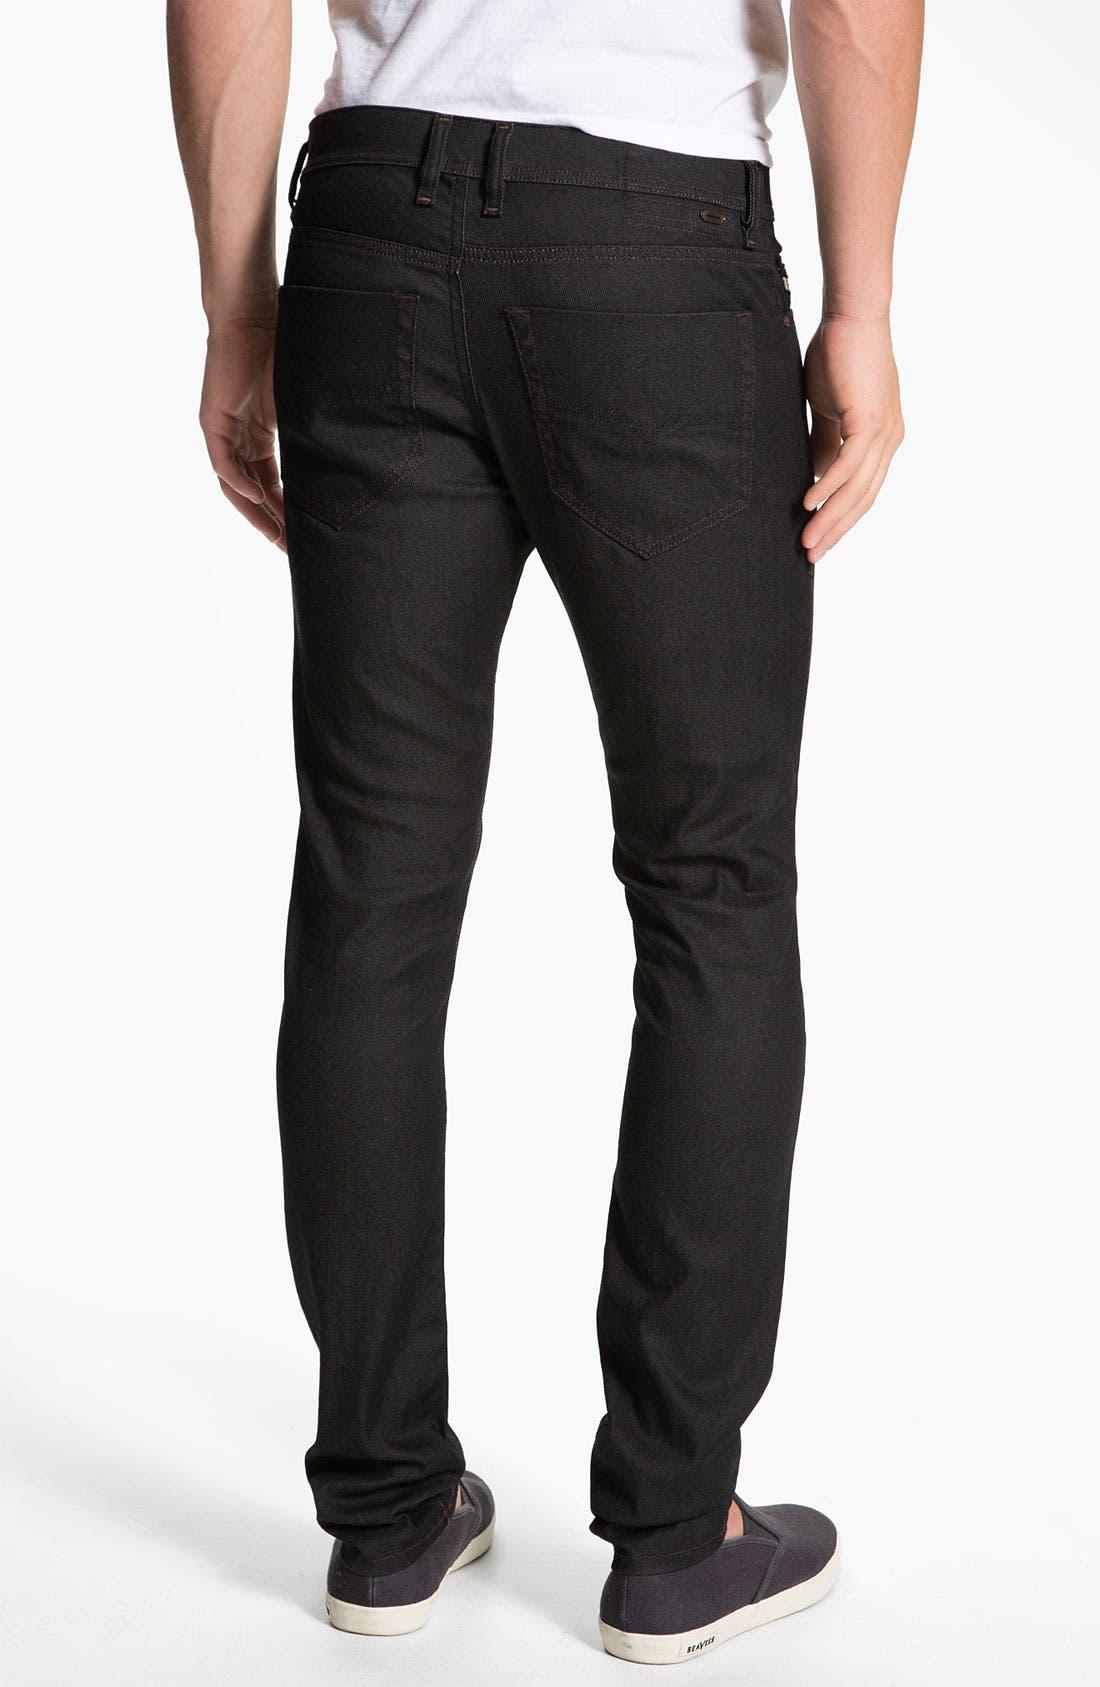 Alternate Image 1 Selected - DIESEL® 'Tepphar' Slim Tapered Leg Jeans (0800W)